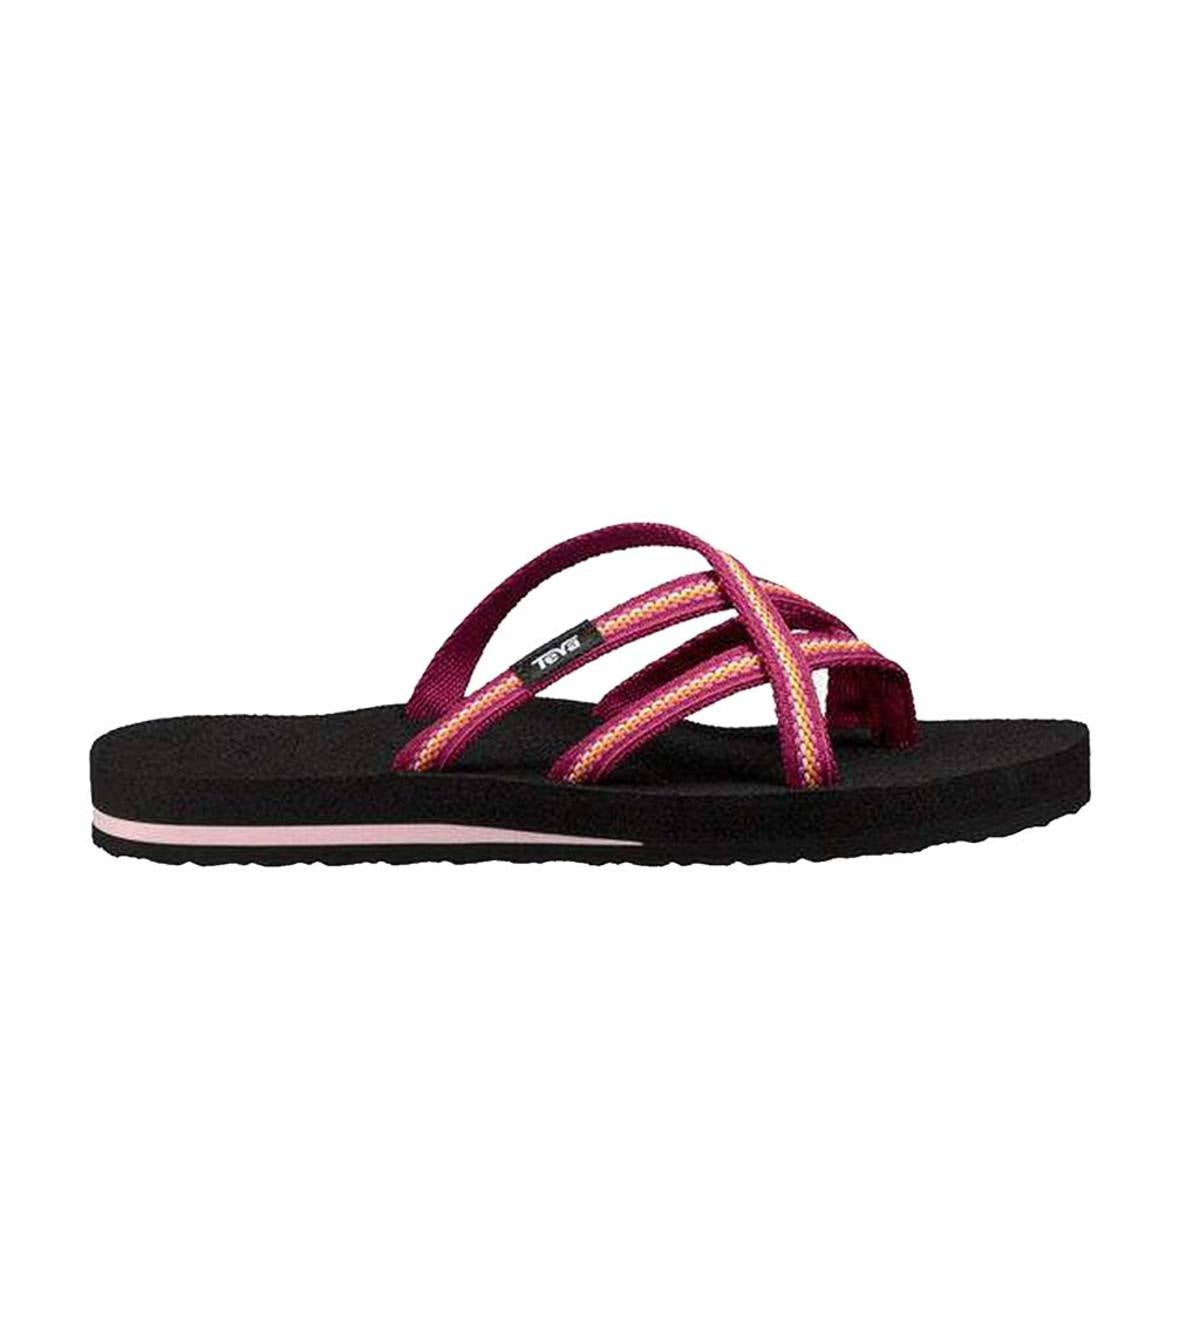 3dd9edd95 Teva Women s Mush Olowahu Flip Flops - Boysenberry - Size 6